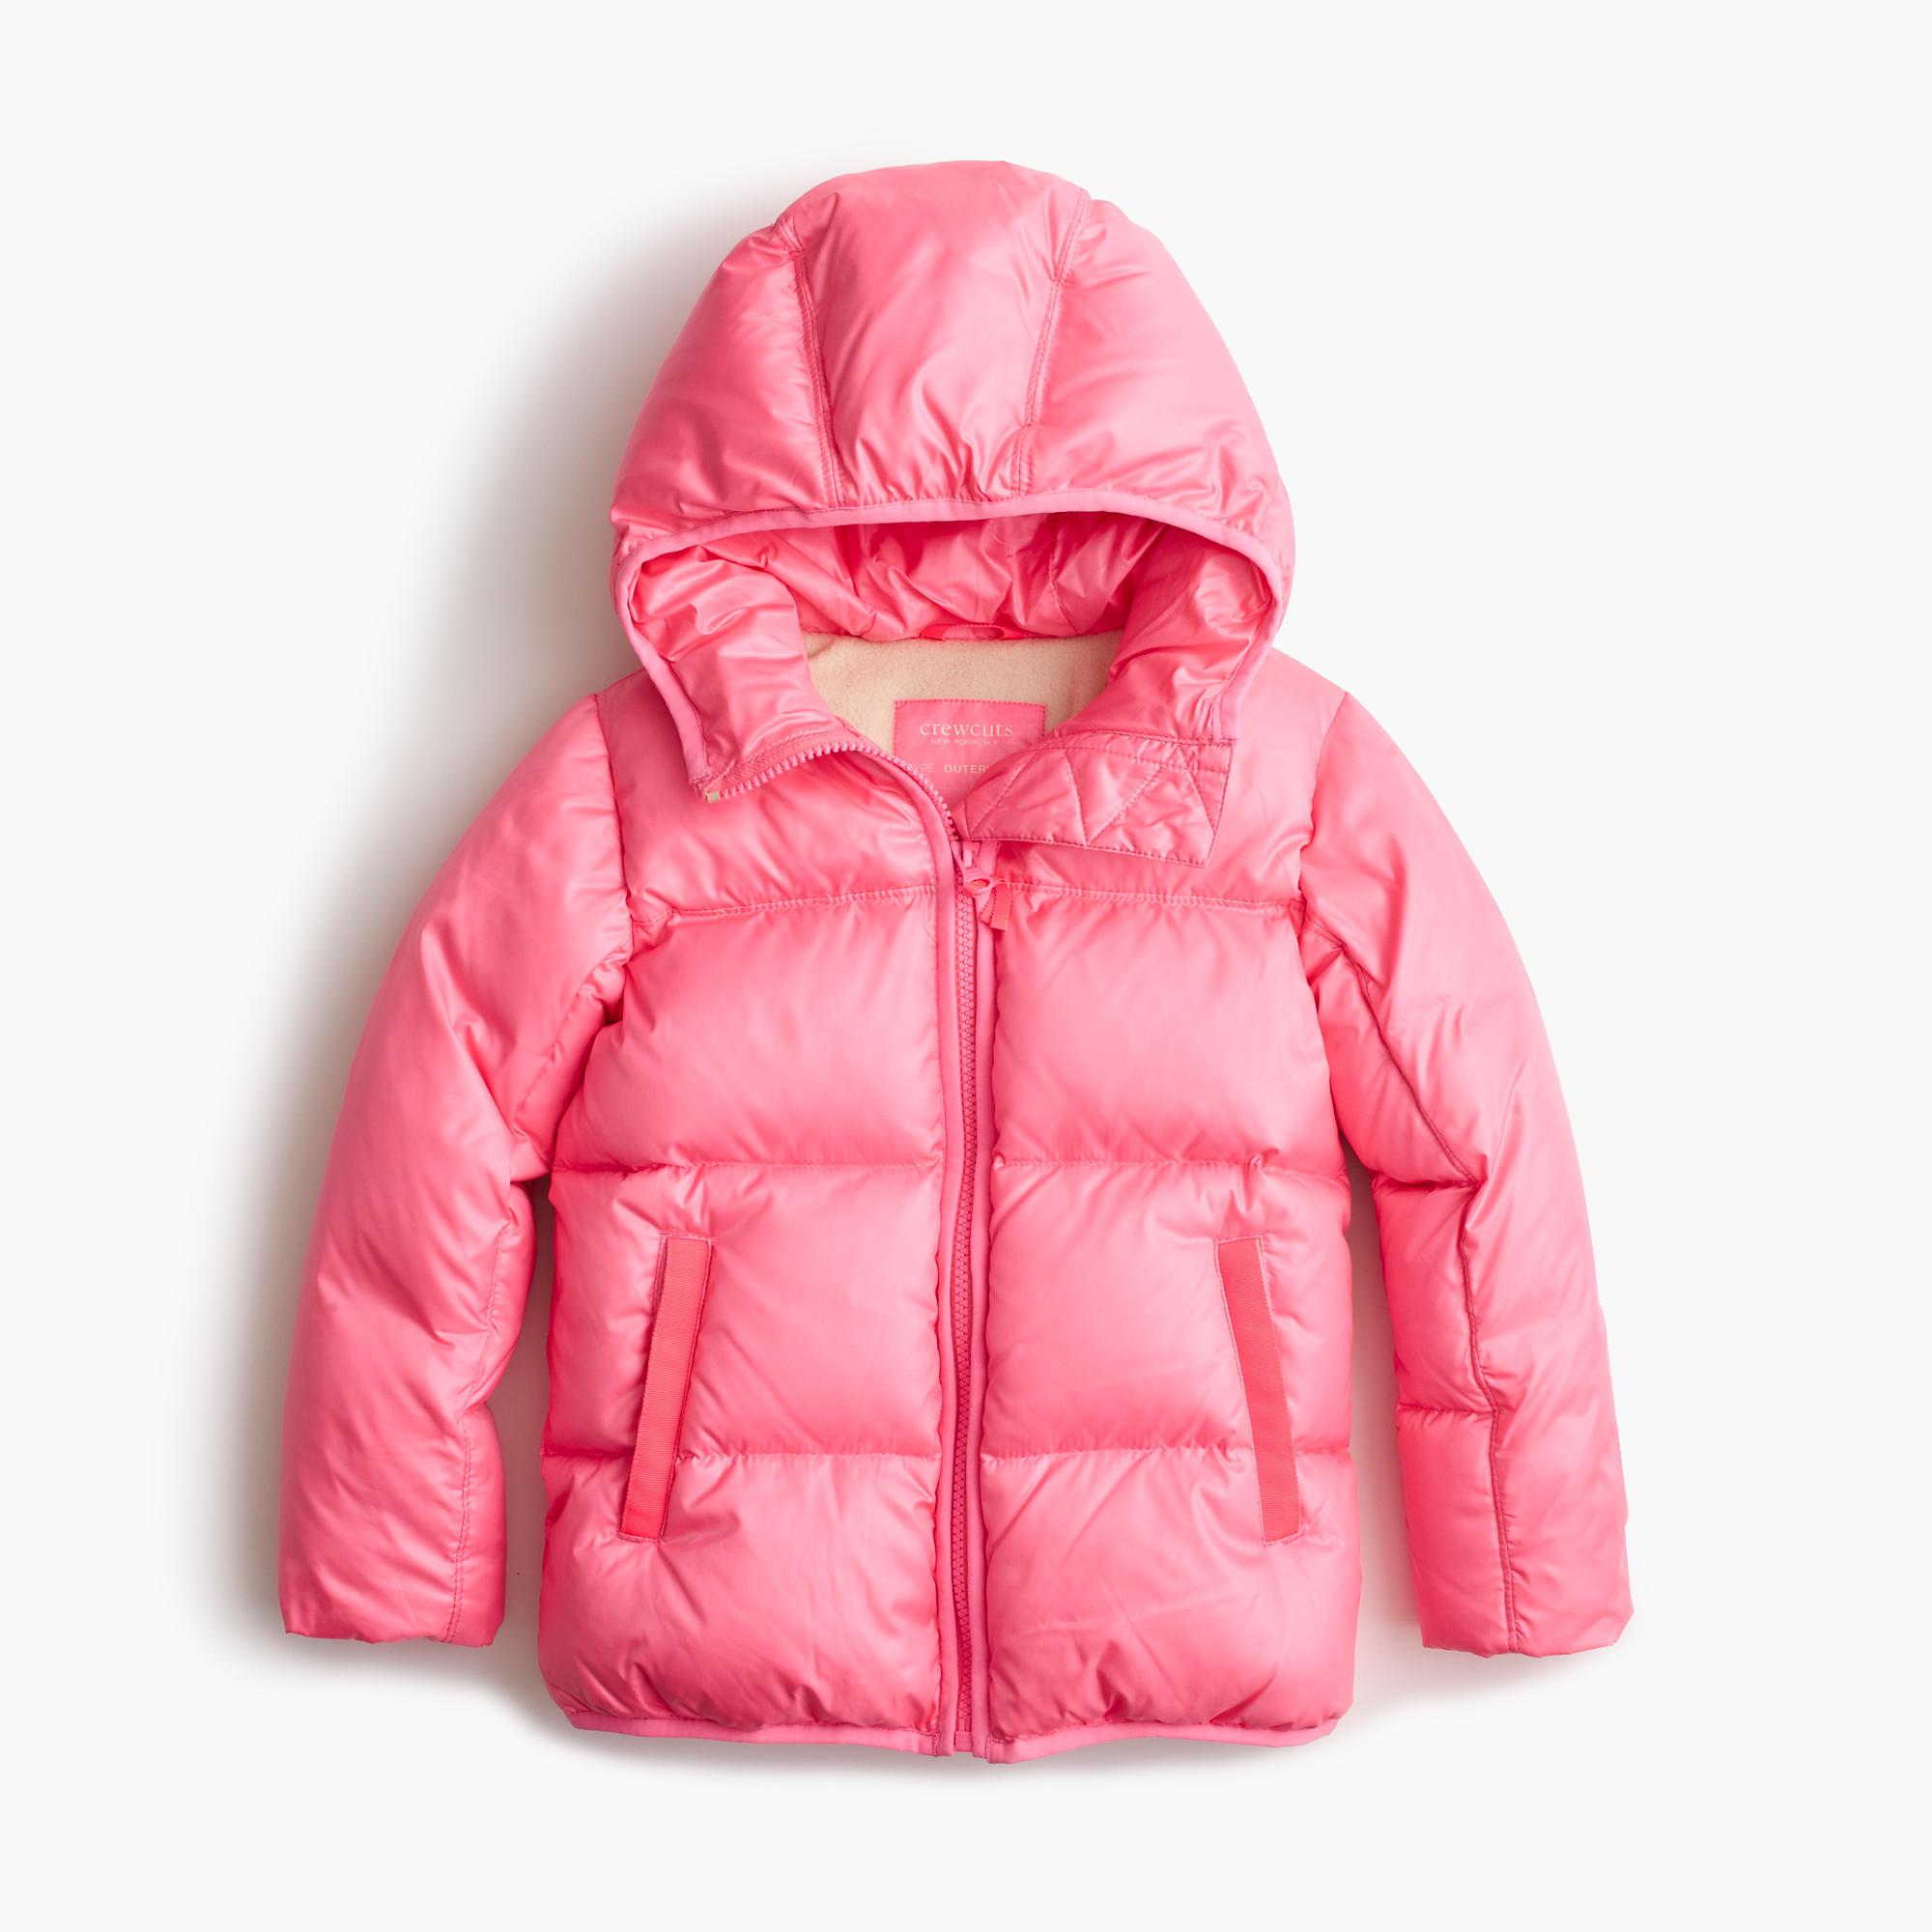 Girls' Marshmallow Puffer Jacket : Girls' Jackets & Coats | J.Crew